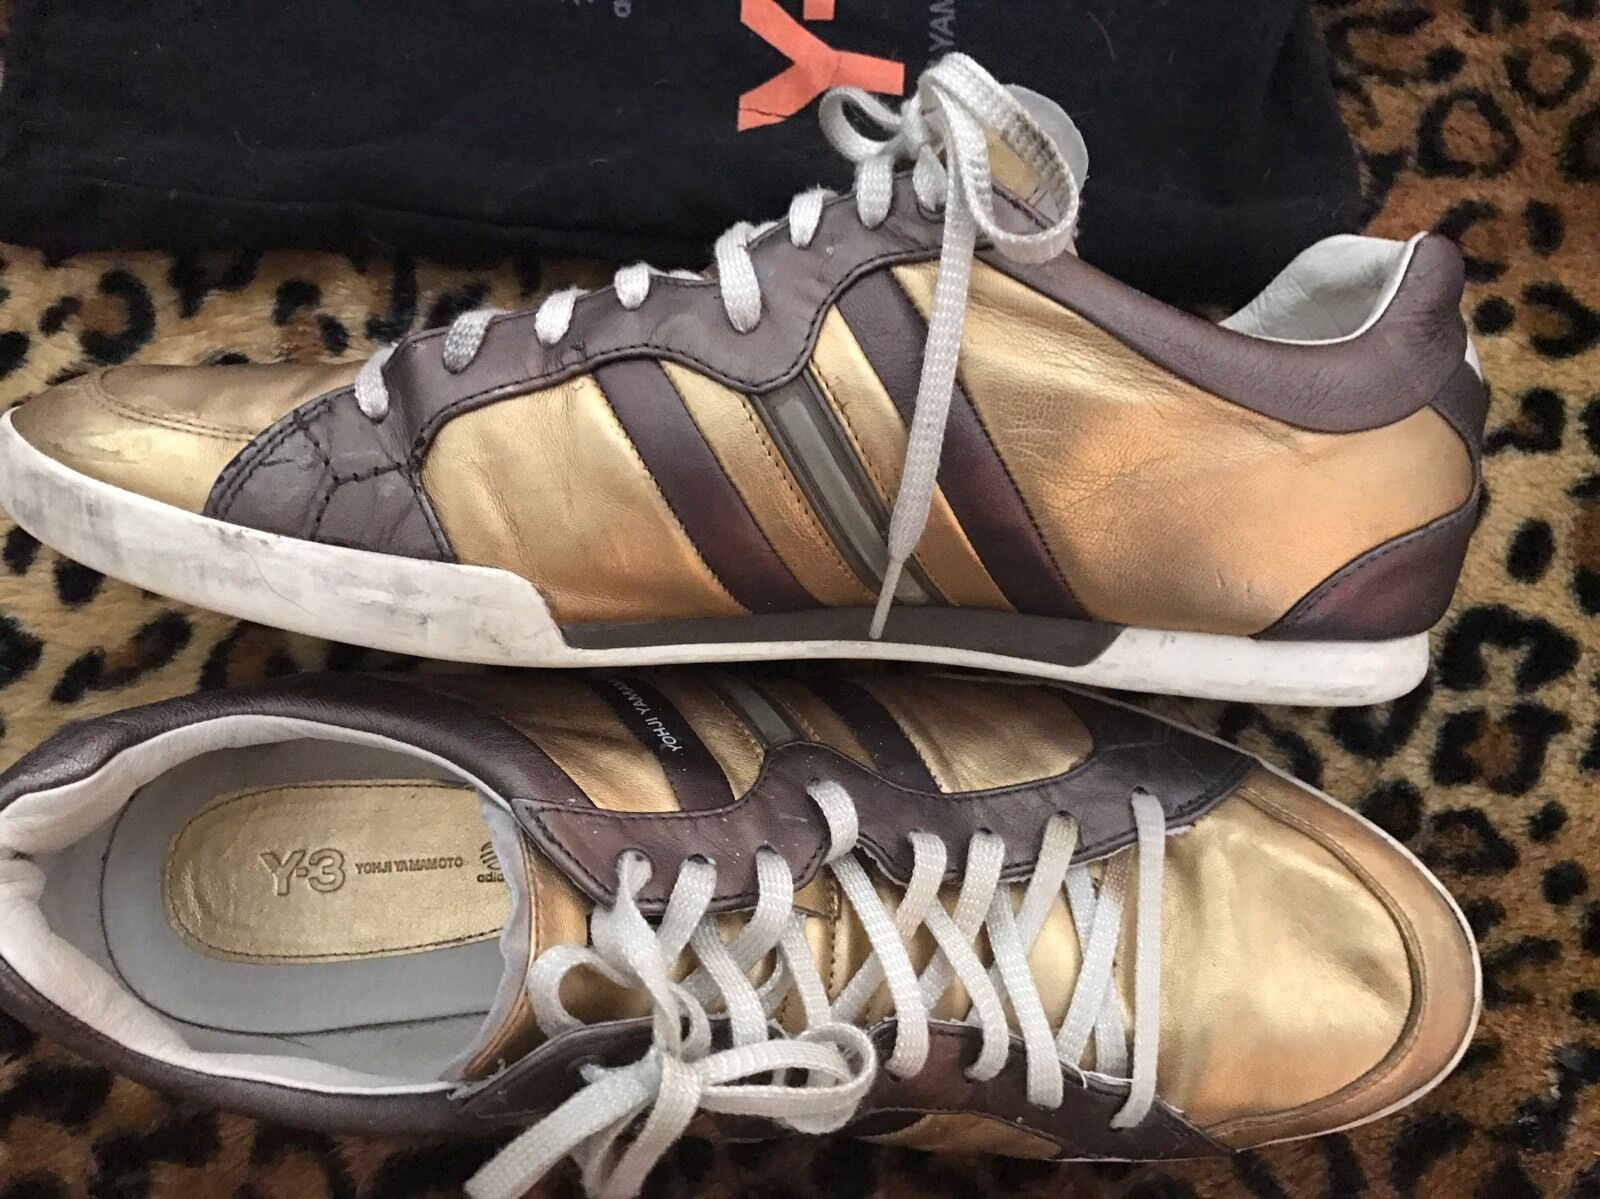 Auth Yohji Yamamoto Y3  Shoes 11.5 Uk Gold Brown